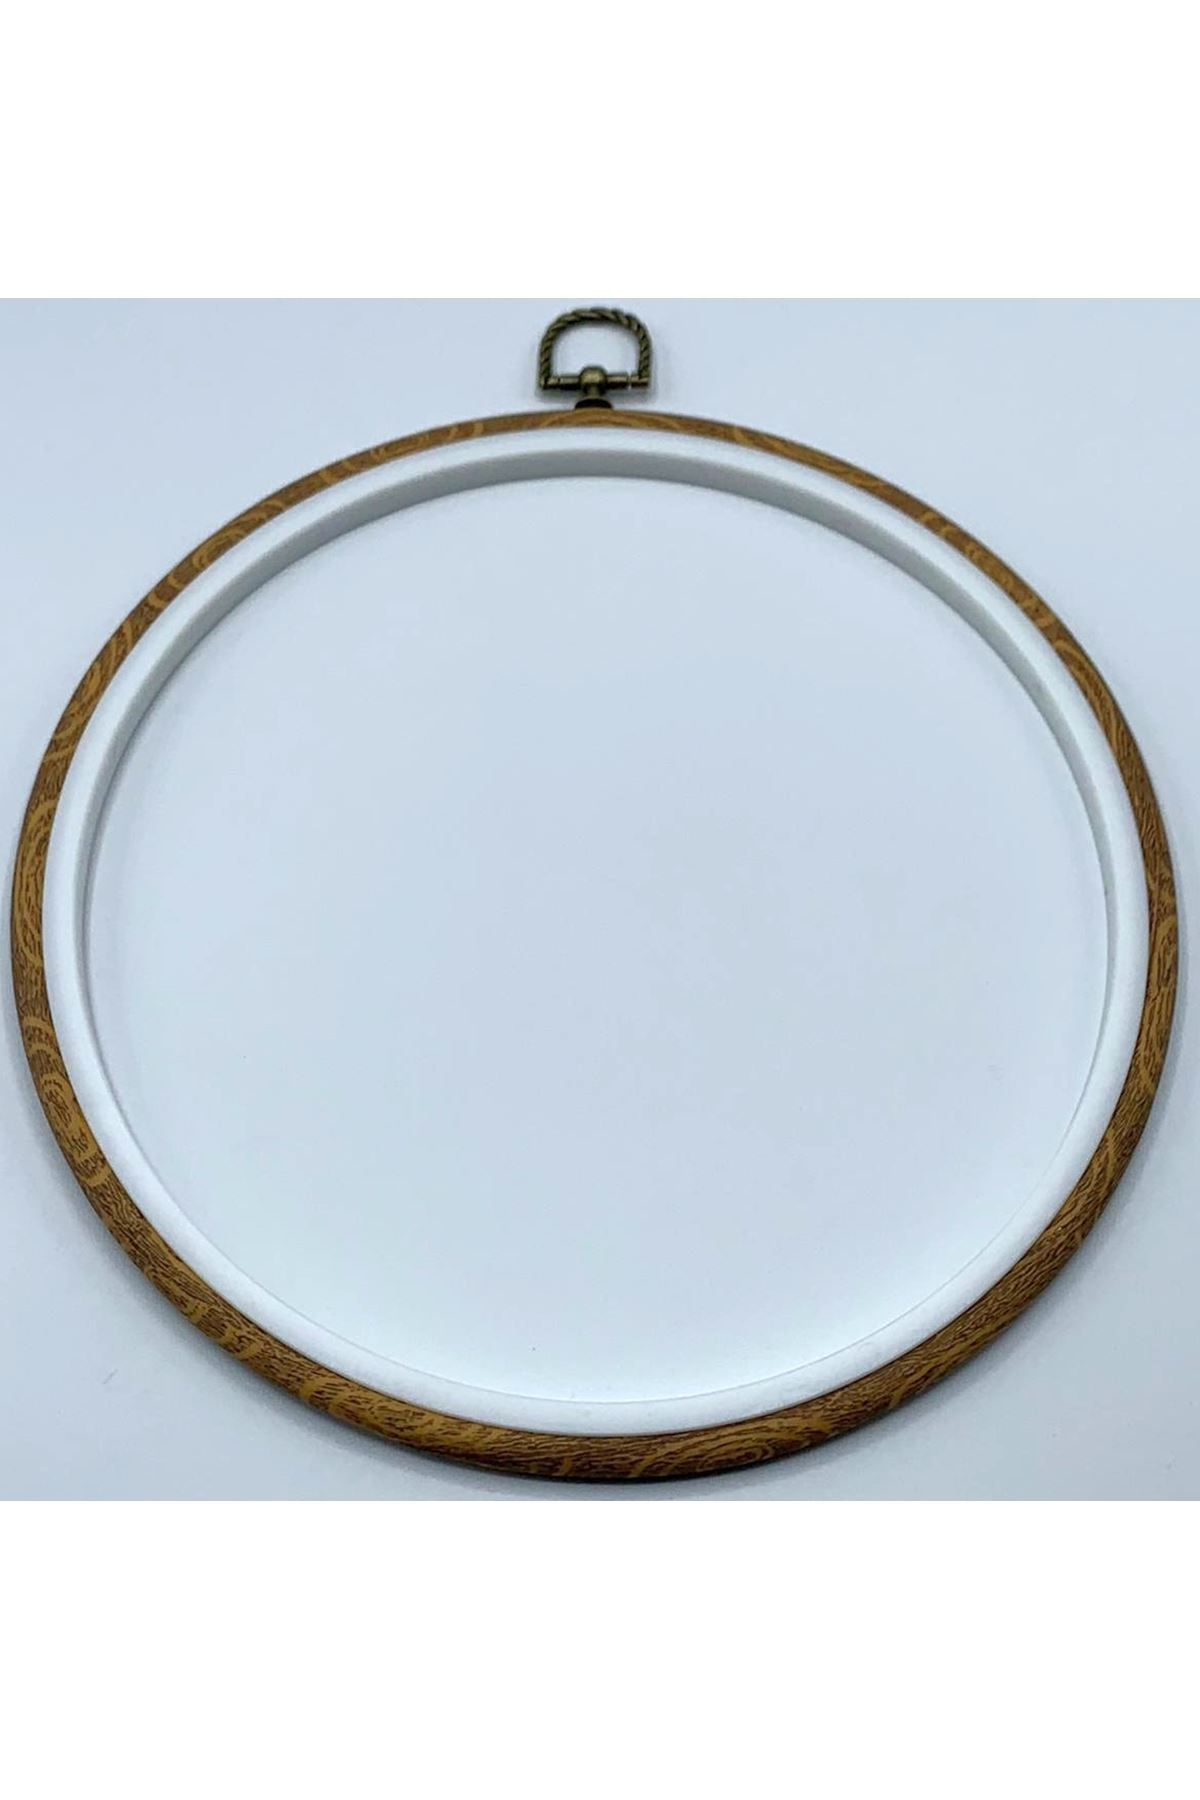 Plastik Kasnak Kahverengi 25 cm